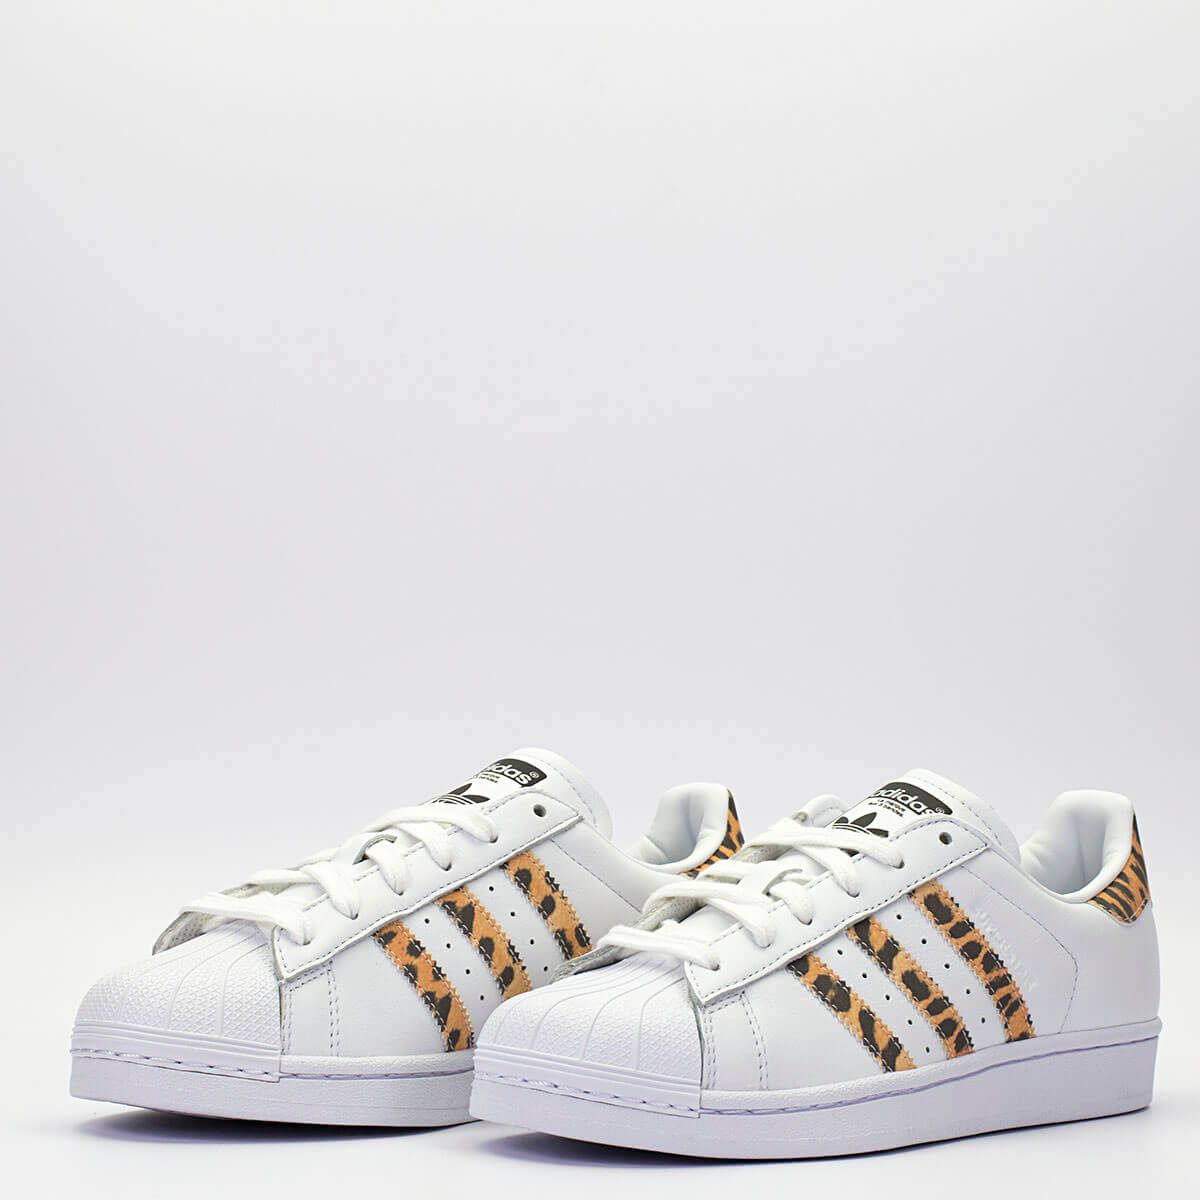 d9f835046ef Adidas Superstar W λευκό με λεοπάρ λεπτομέρειες. #sneakerstown  #sneakerheads #adidasoriginals #adidas #adidassuperstar #superstar #fashion  #sneakers #women ...